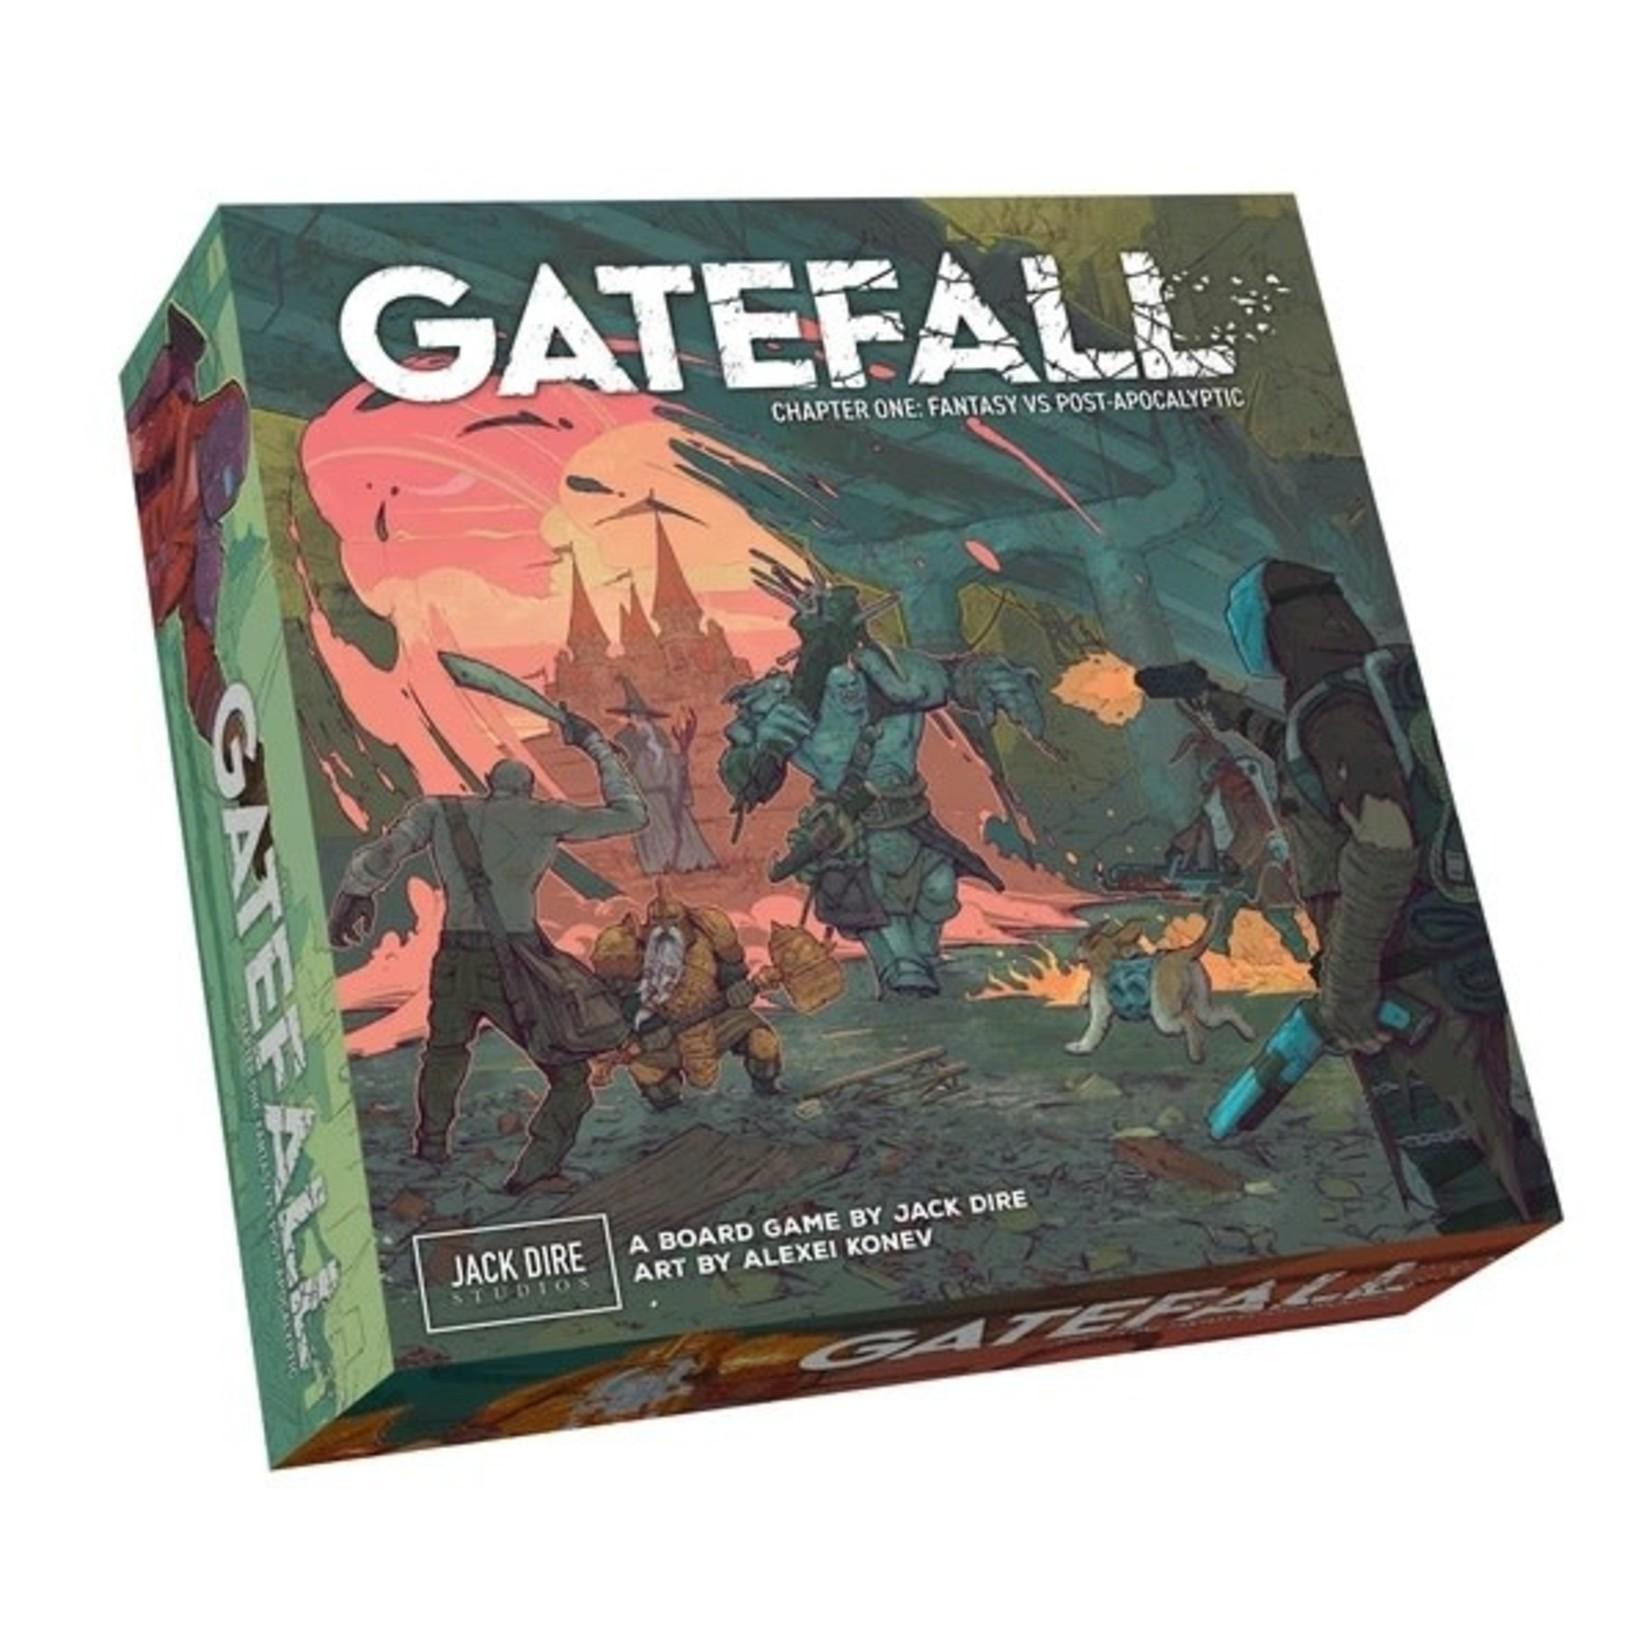 Jack Dire Studios Gatefall Chapter One: Fantasy vs Post-Apocalyptic (Kickstarter)